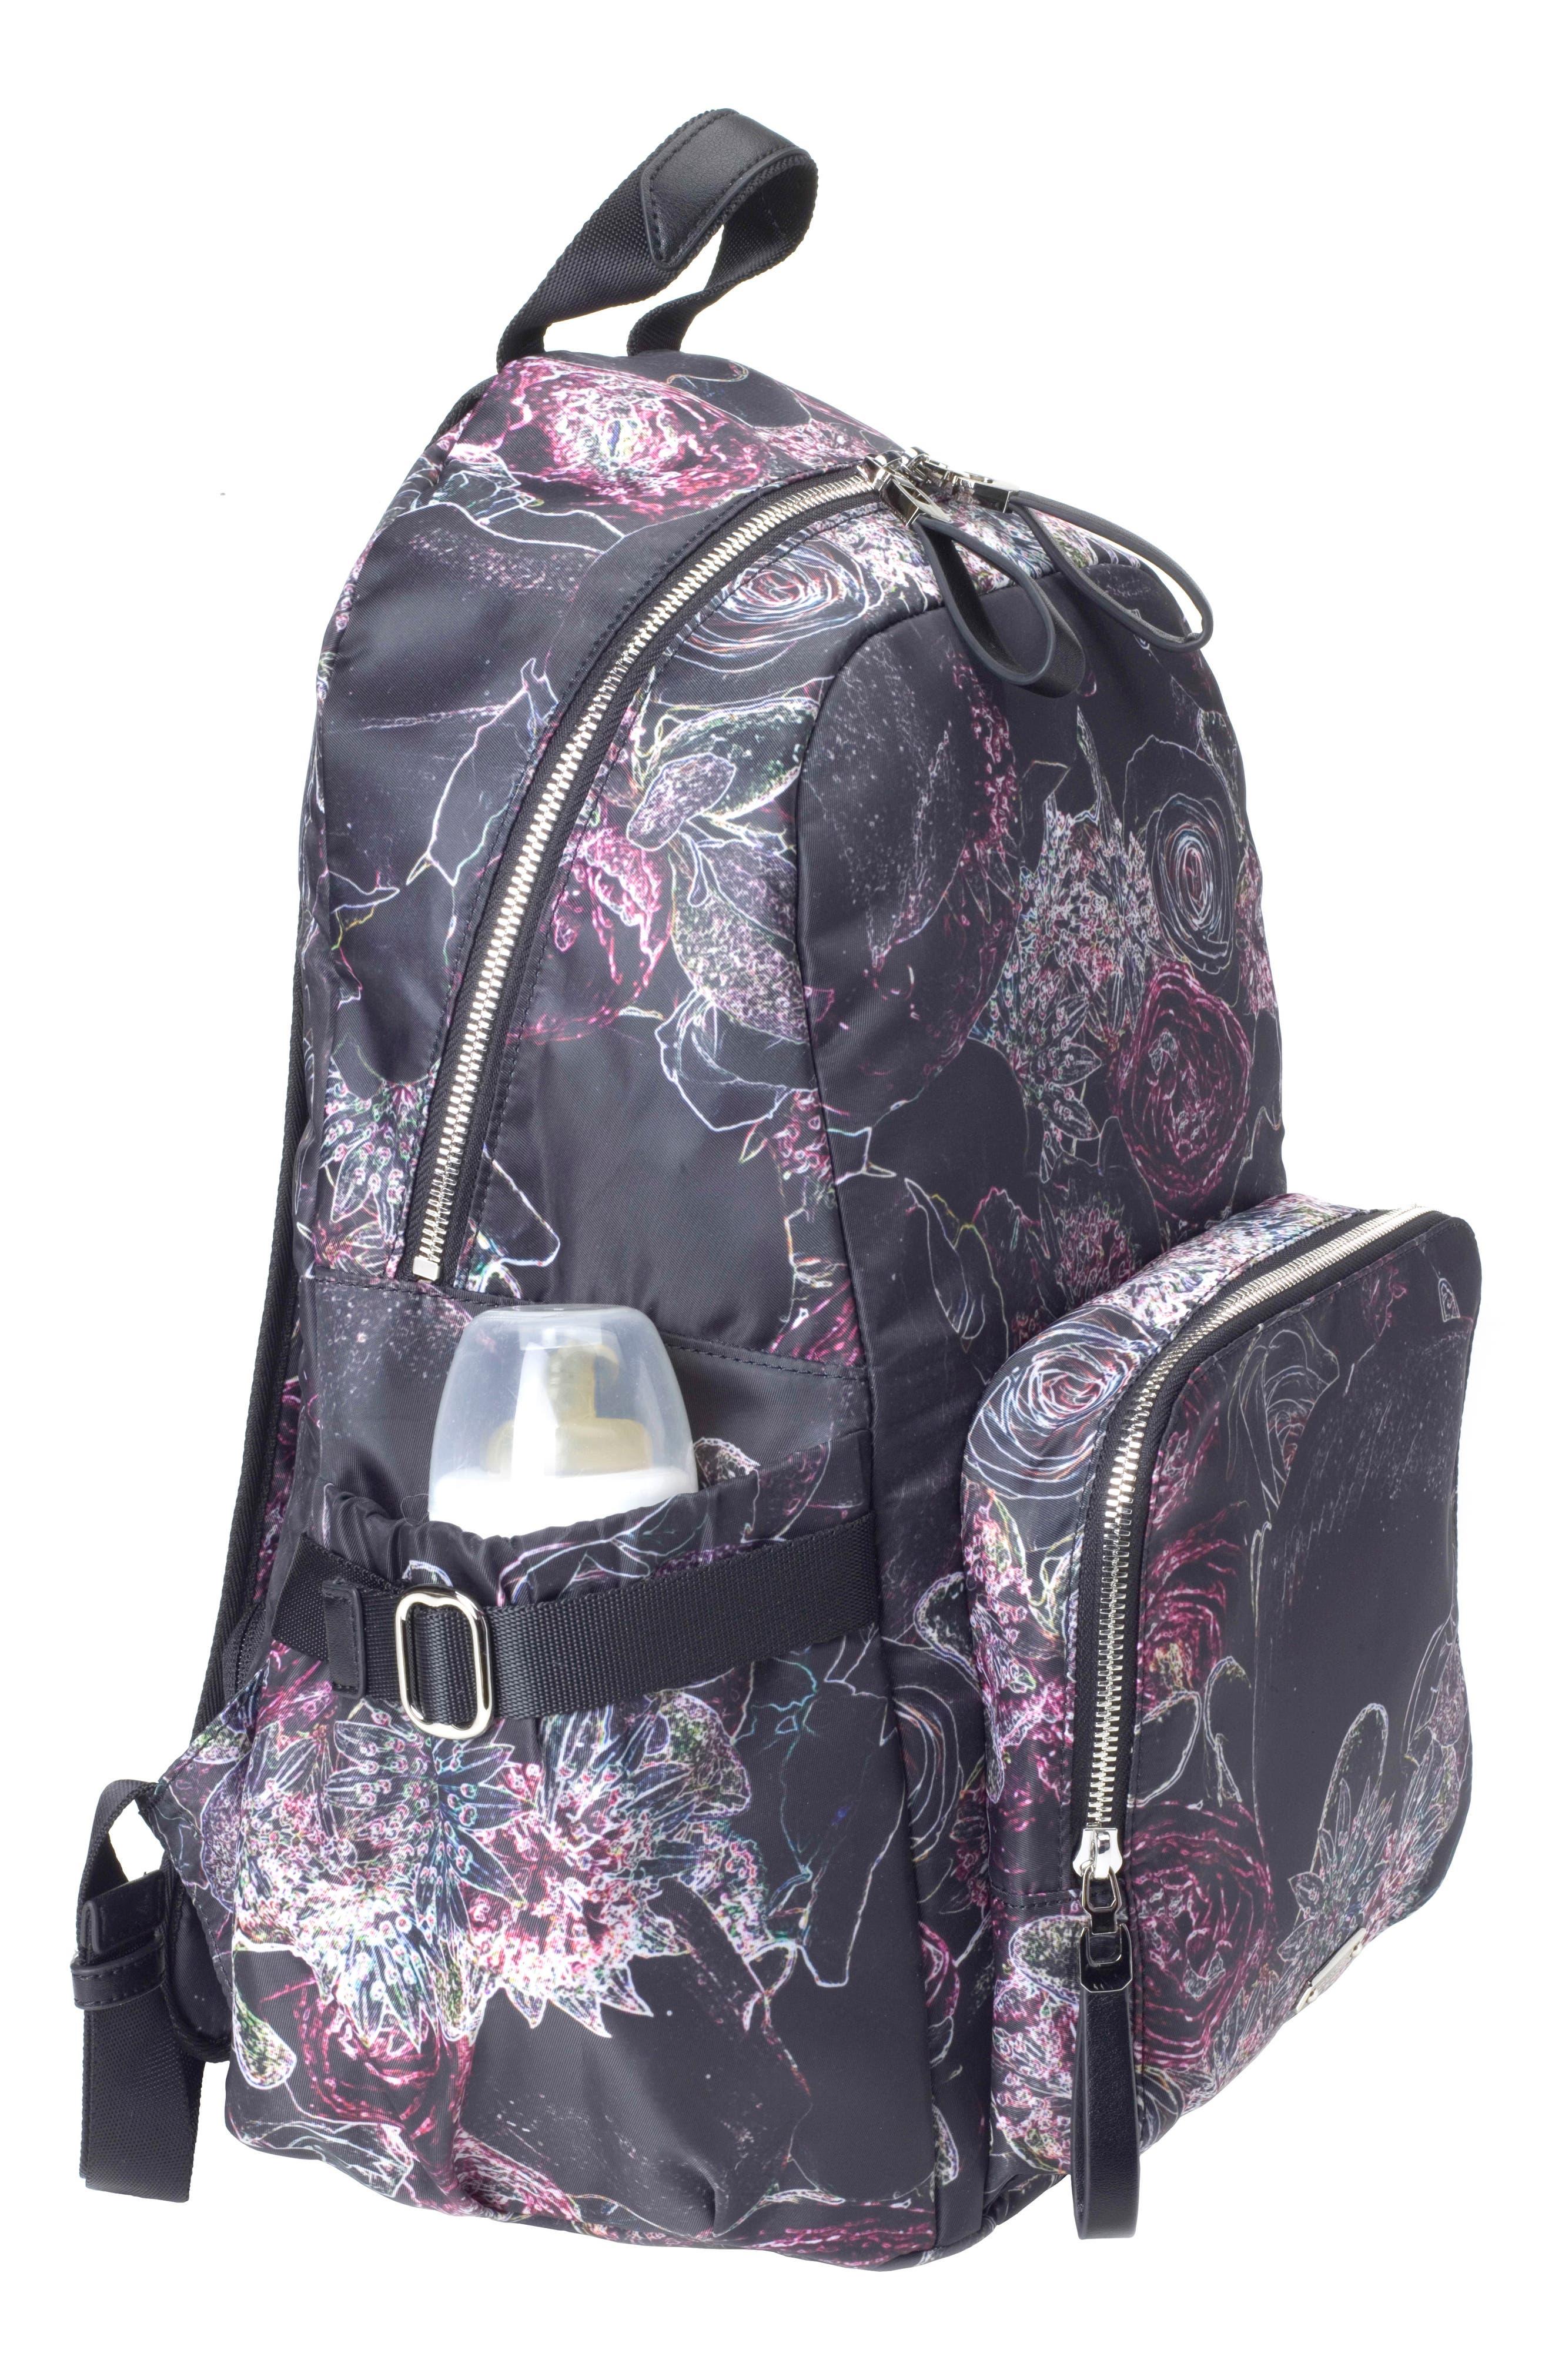 Hero Water Resistant Nylon Backpack Diaper Bag,                             Alternate thumbnail 5, color,                             Neon Floral